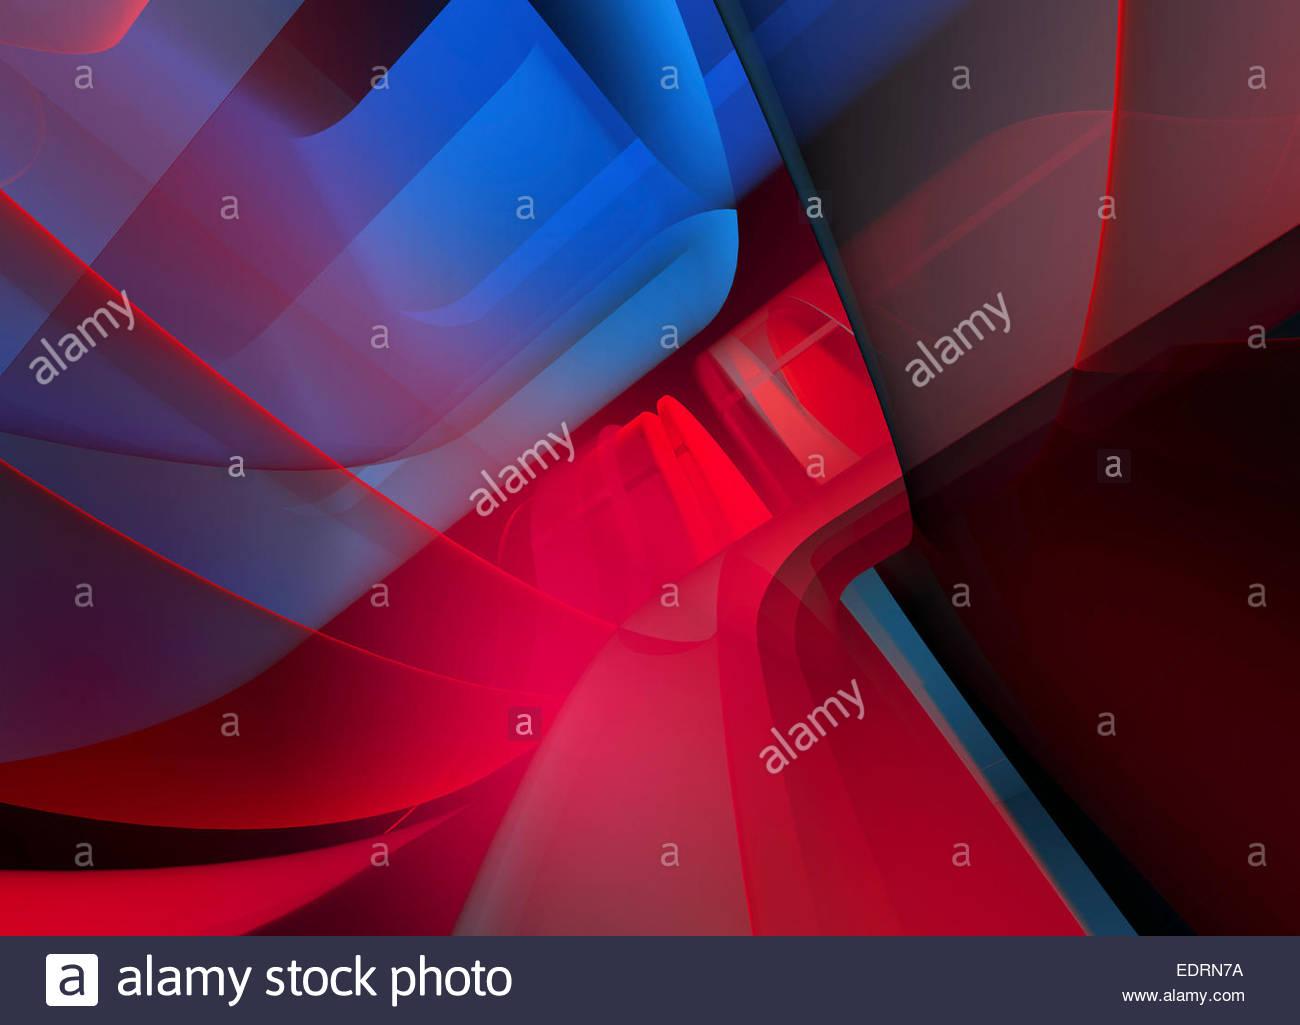 Abstract full frame patrón fondos rojo y azul Imagen De Stock